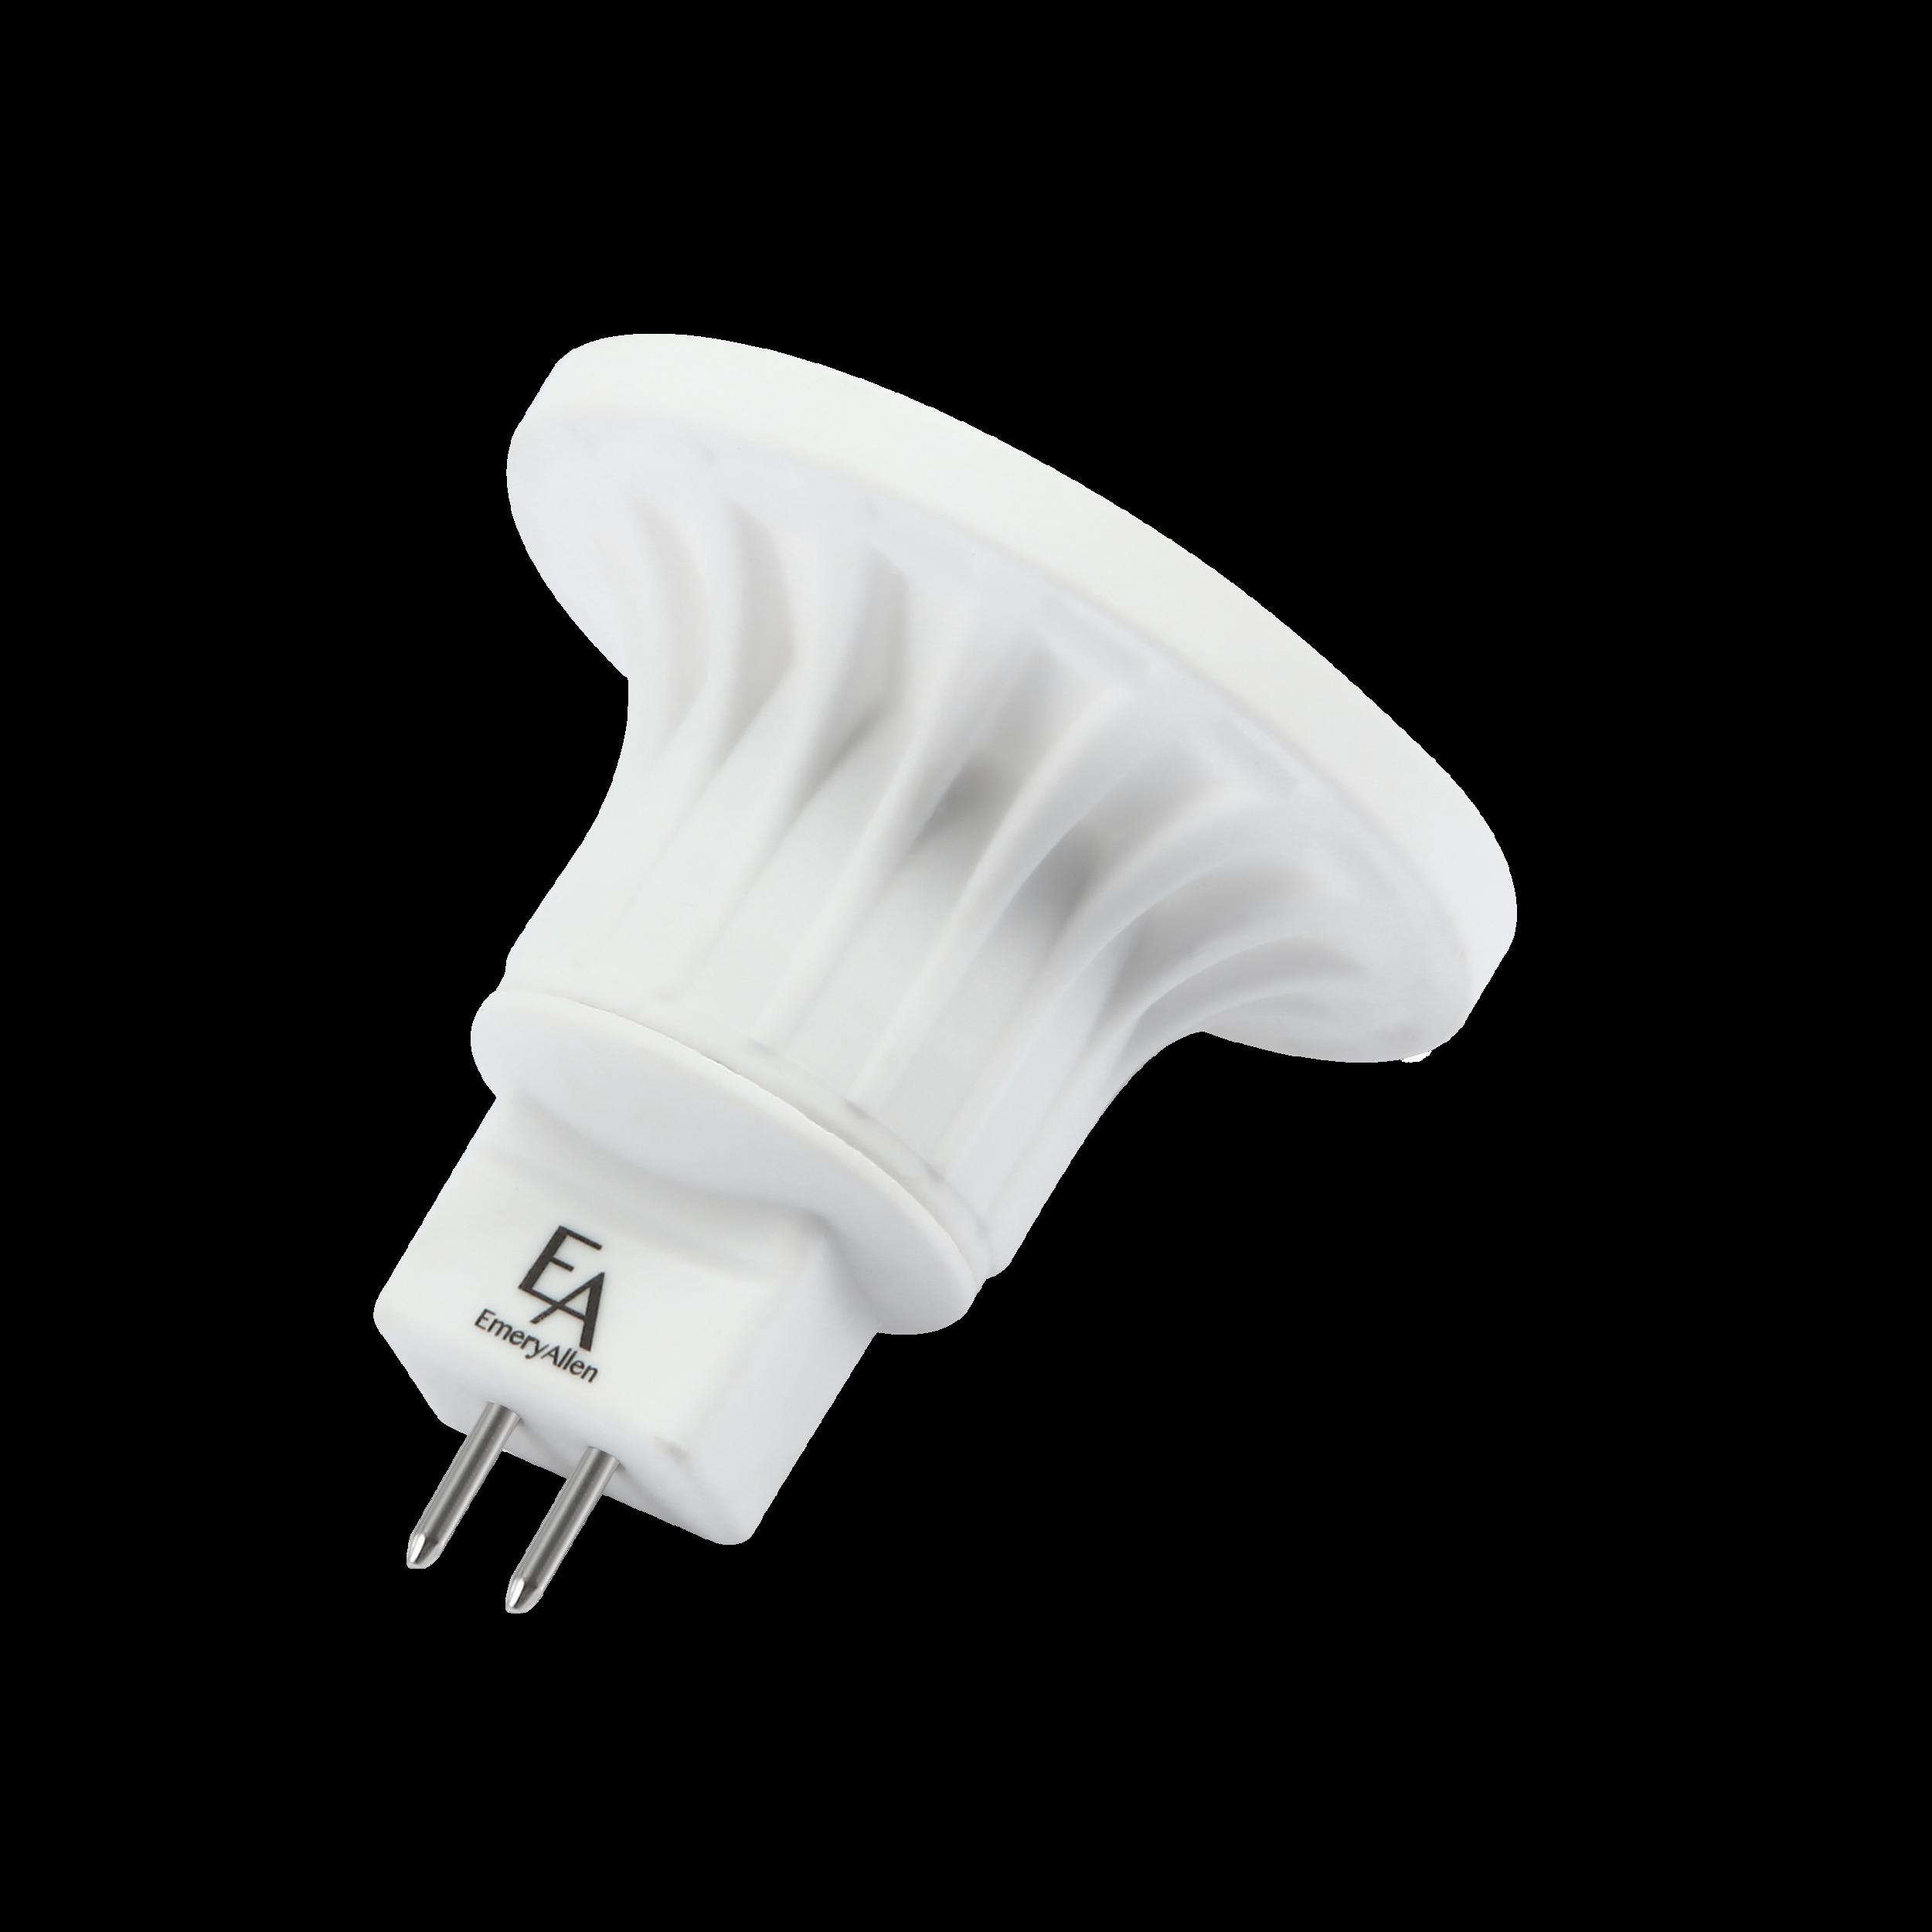 5.0 W - 390 - 450 lumens